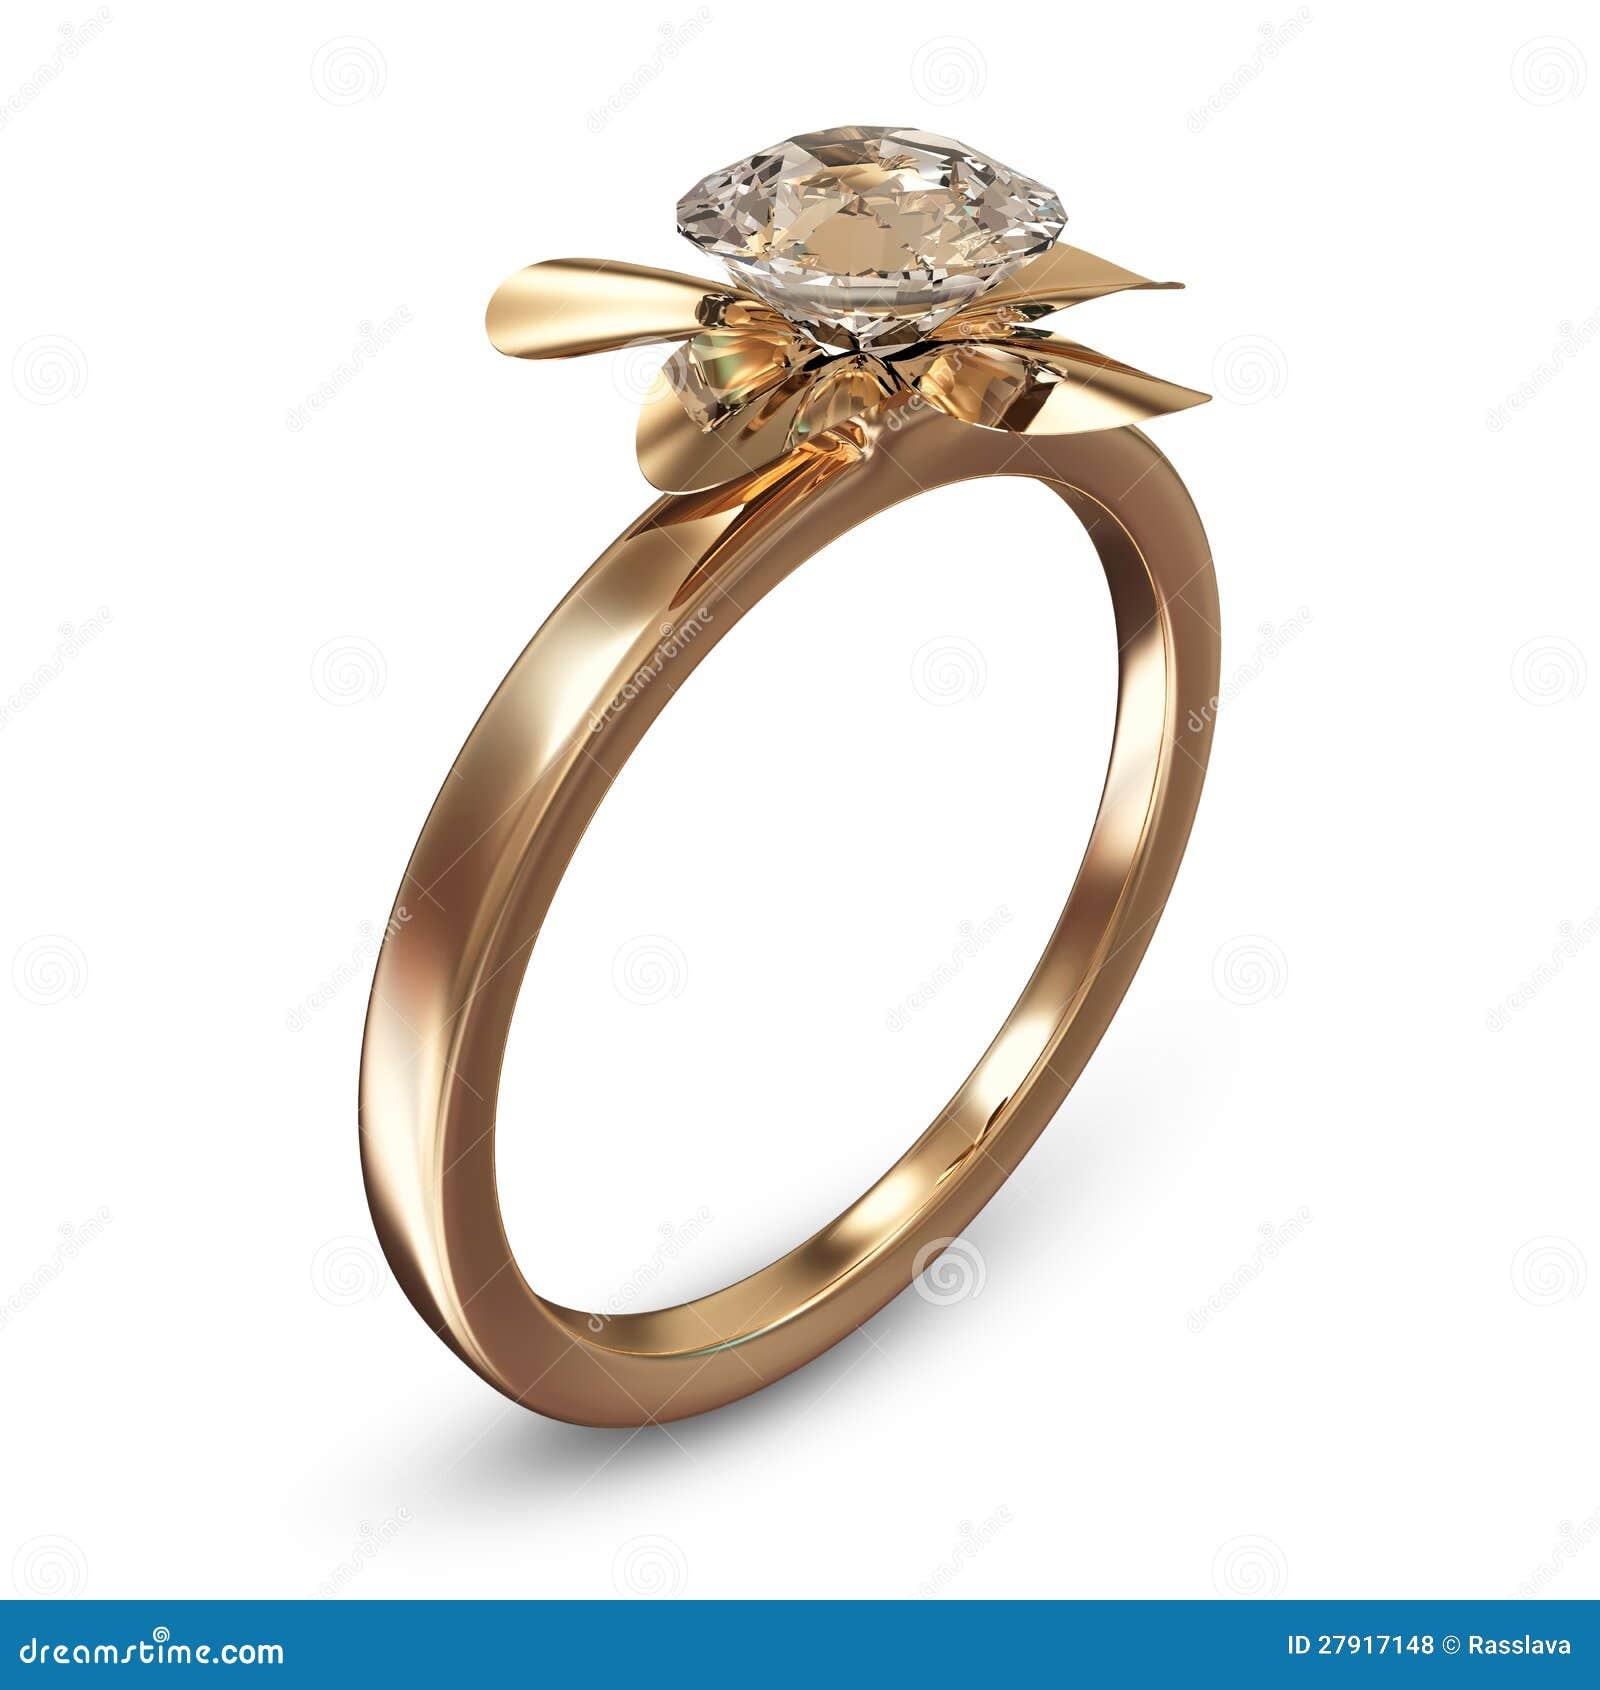 goldener ehering mit diamanten lizenzfreie stockfotos bild 27917148. Black Bedroom Furniture Sets. Home Design Ideas